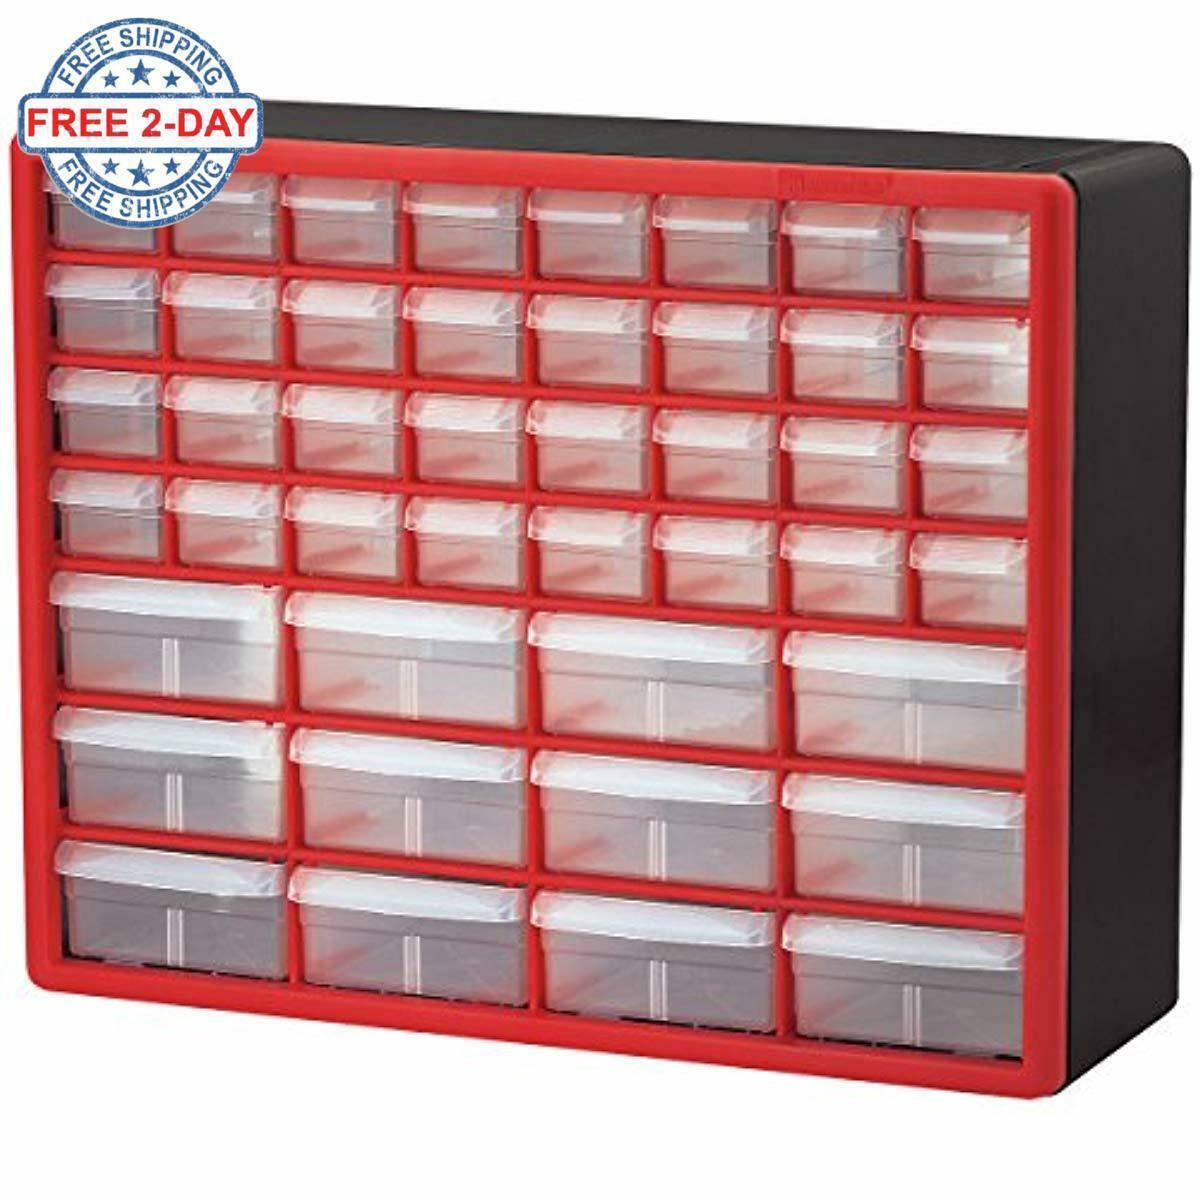 Details About Small Parts Storage Cabinet Drawer Bin Organizer Box 44 Drawers Bins Craft